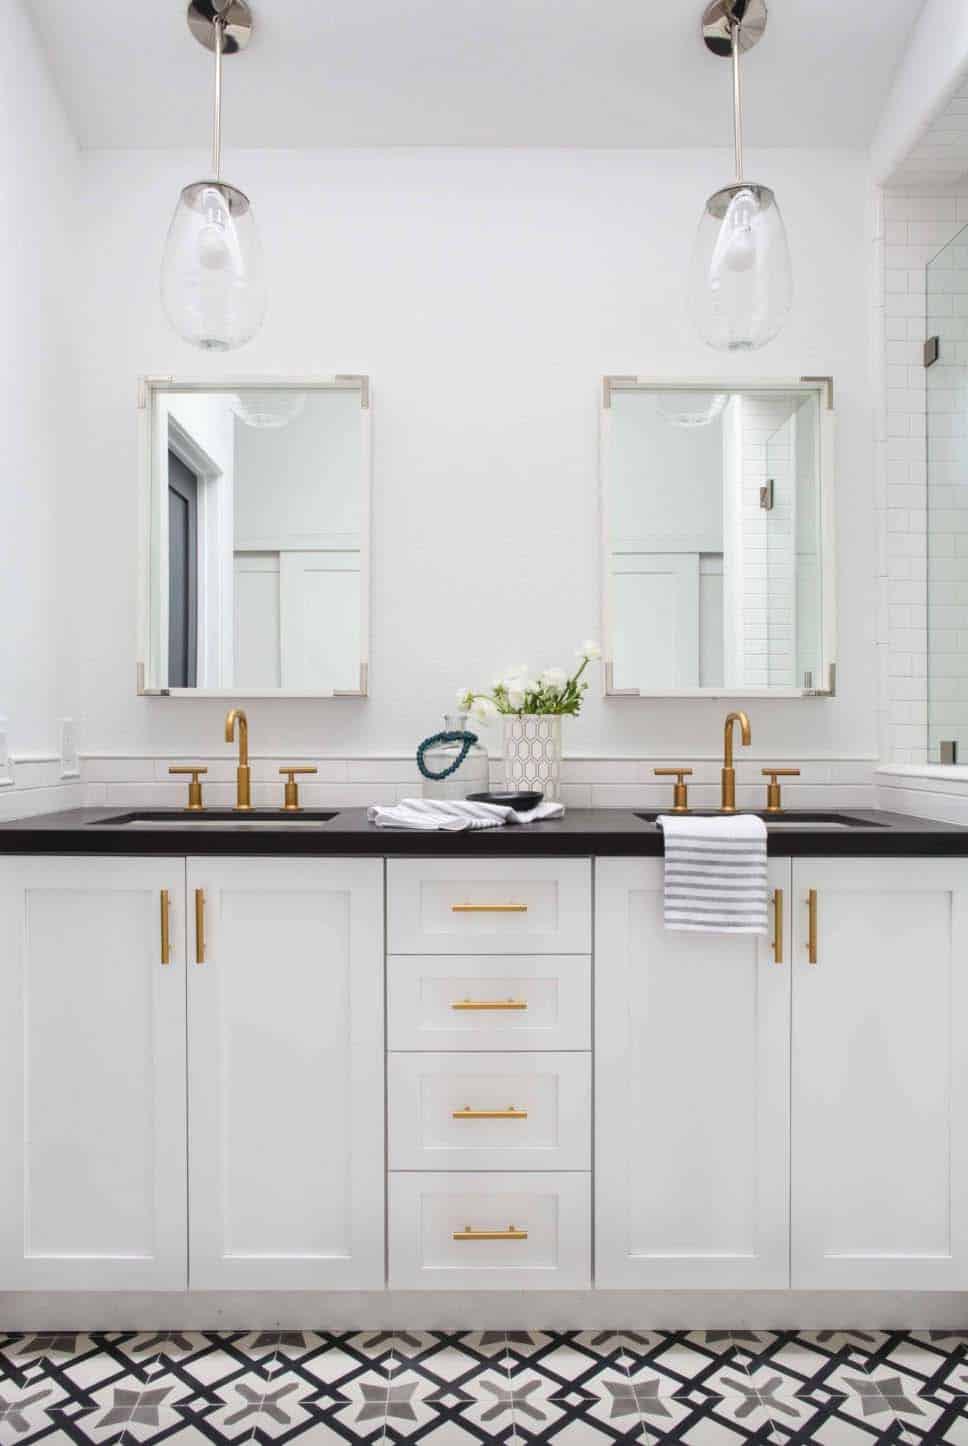 California Eclectic Home-Lindye Galloway Interiors-23-1 Kindesign